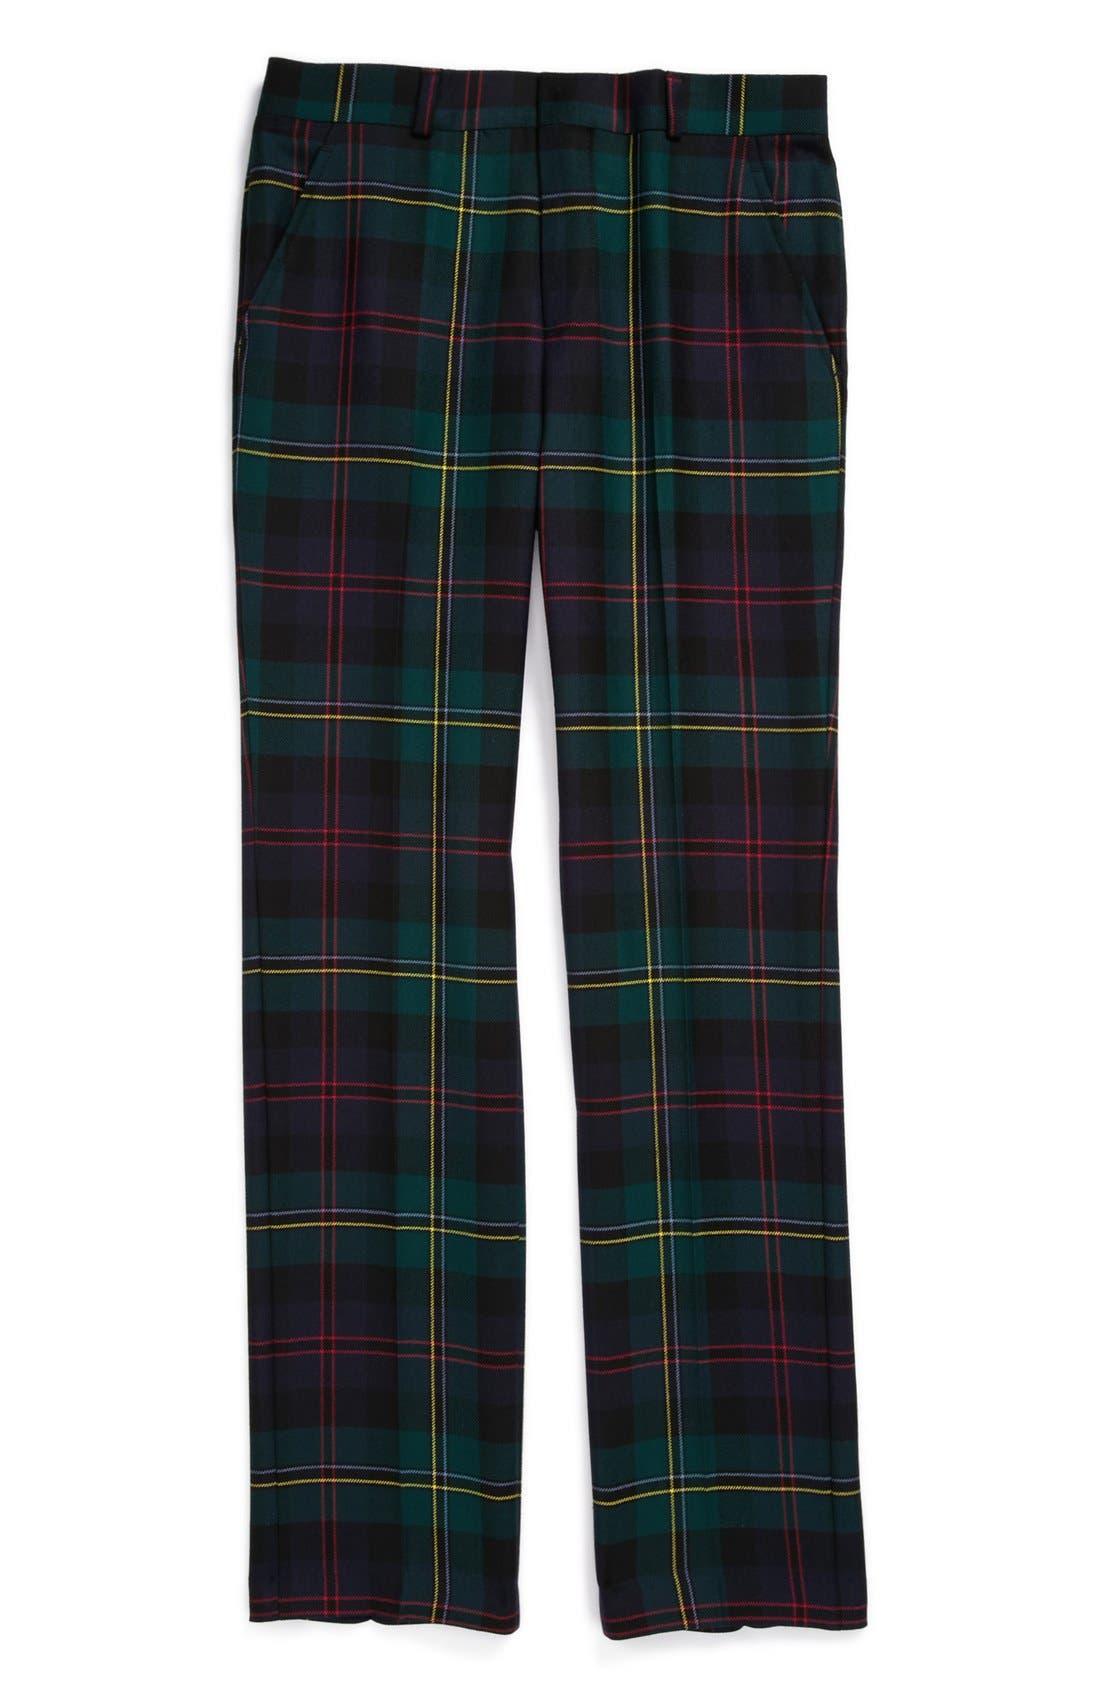 Alternate Image 1 Selected - Brooks Brothers 'Malcolm' Plaid Pants (Big Boys)